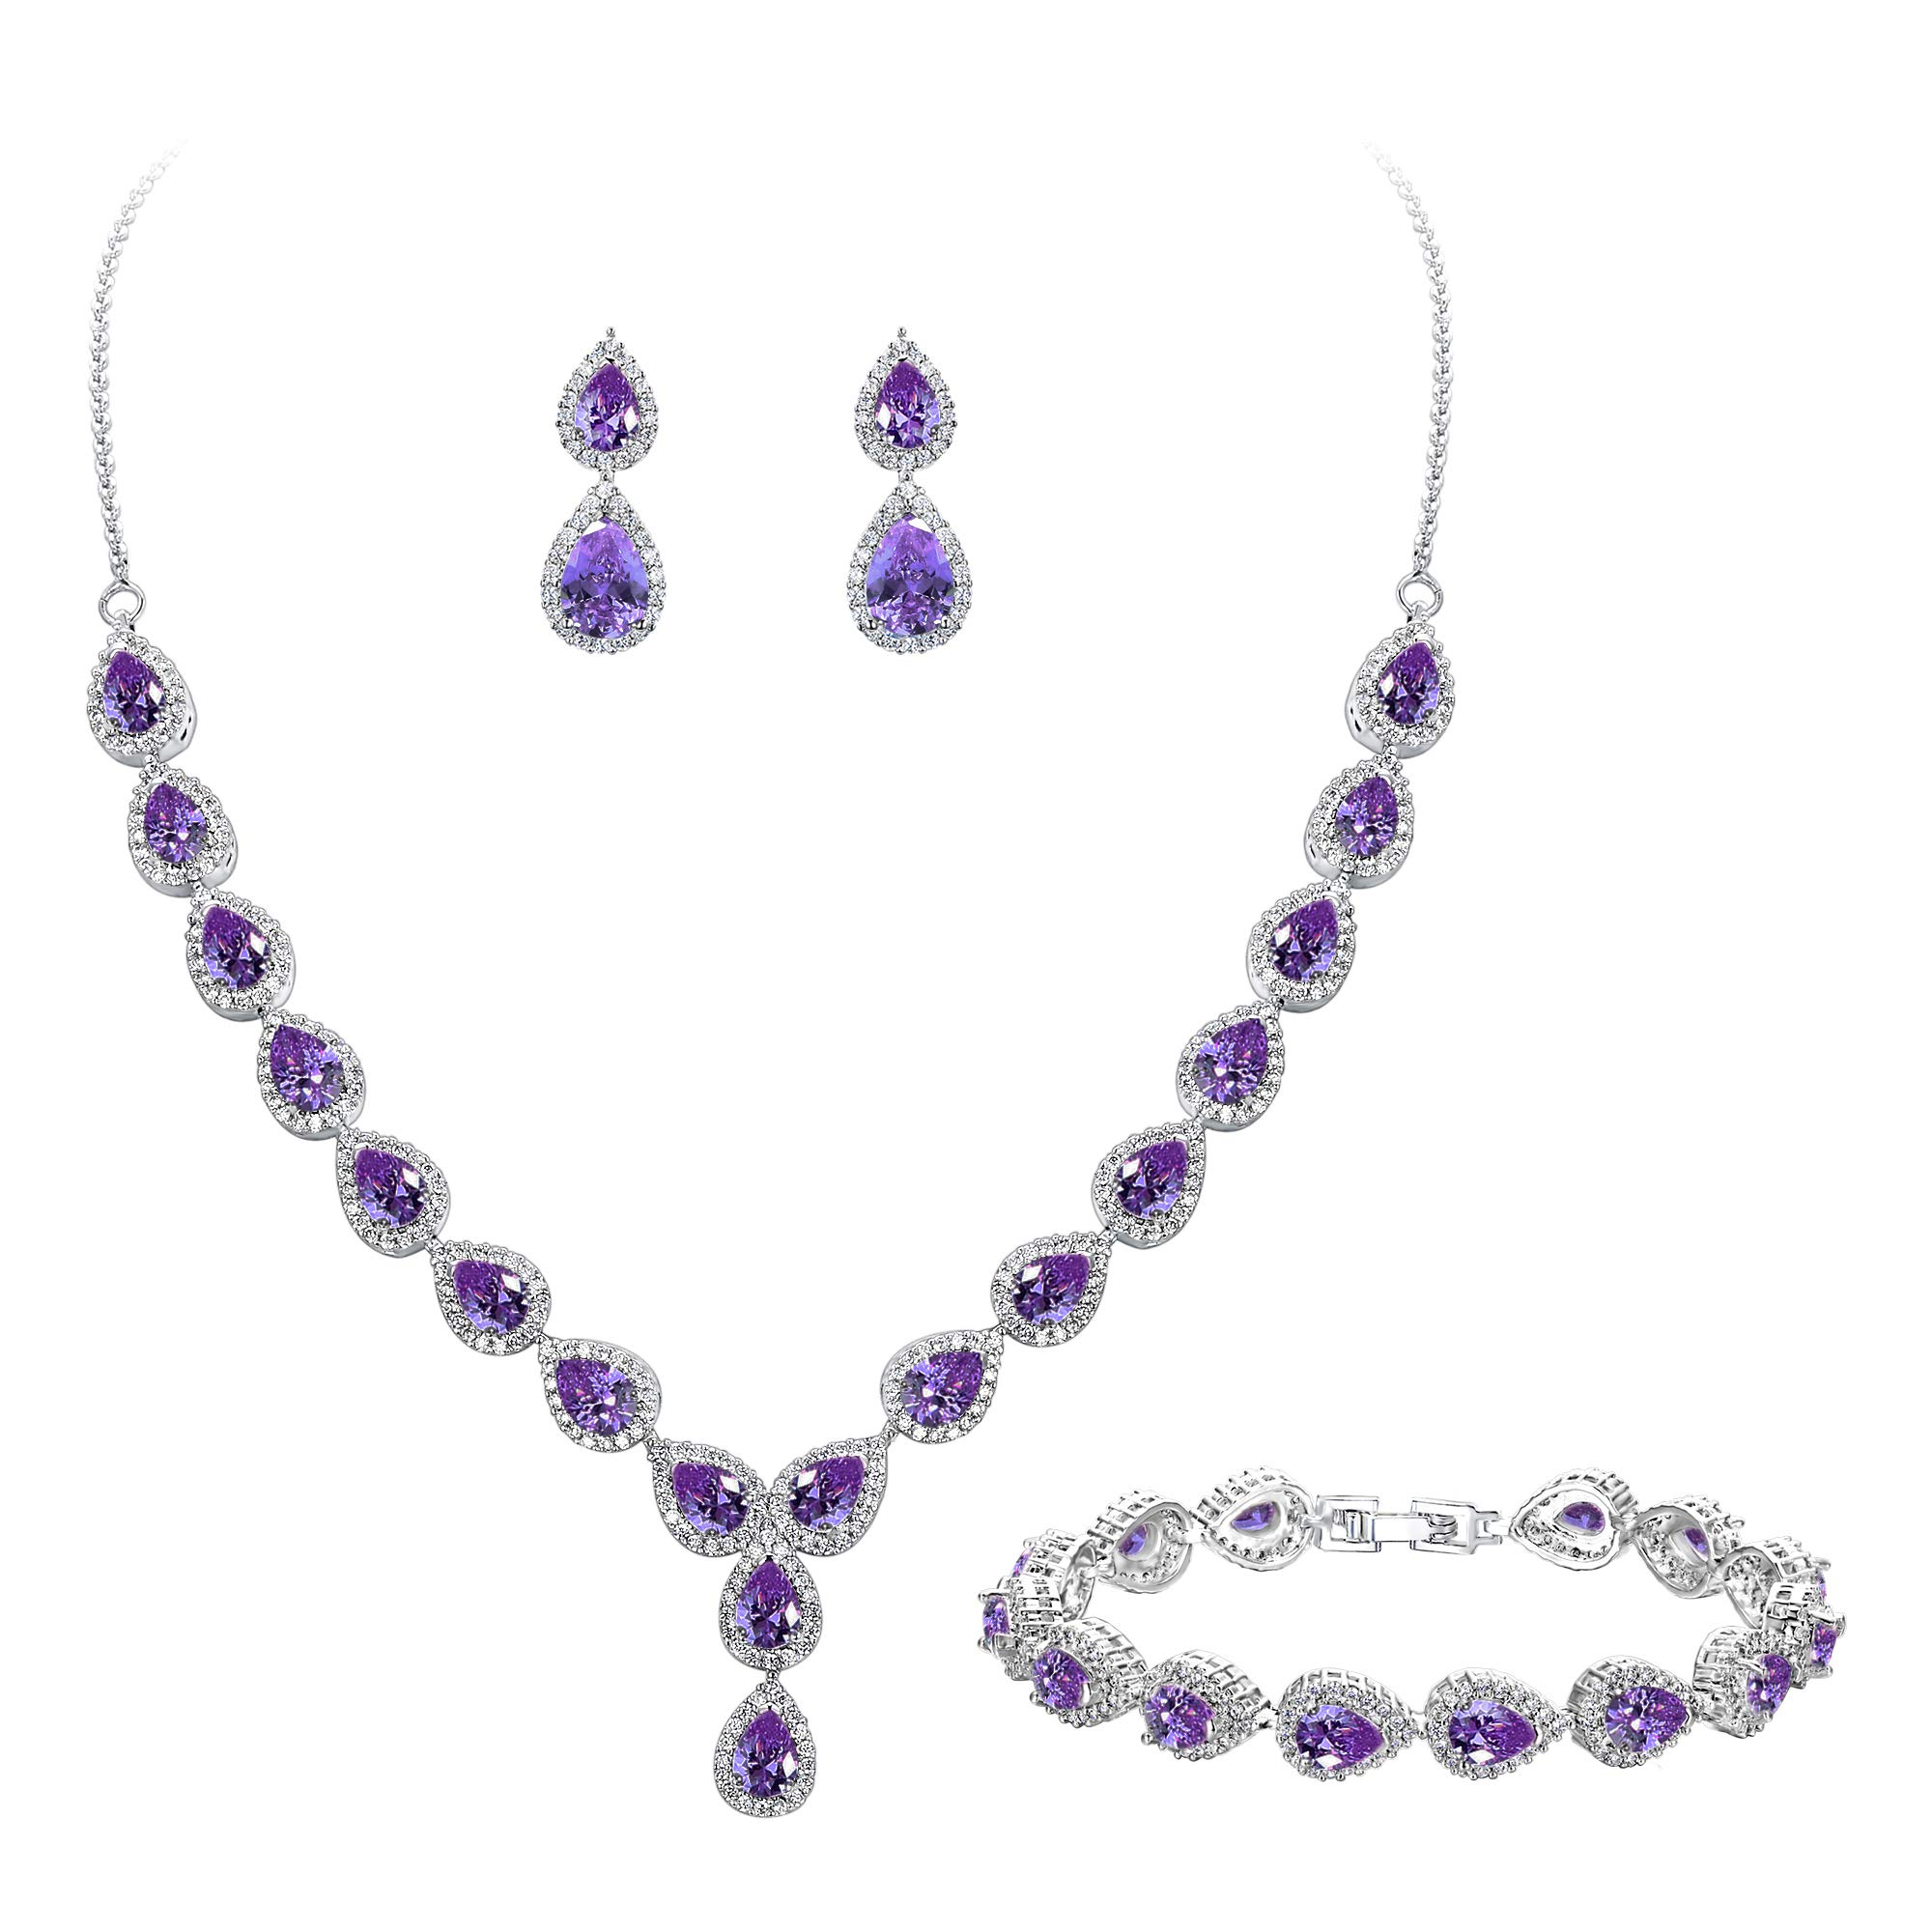 BriLove Women's Wedding Bridal Jewelry Set Y-Necklace Tennis Bracelet Dangle Earrings Set with Teardrop CZ Infinity Figure 8 Amethyst Color Silver-Tone February Birthstone